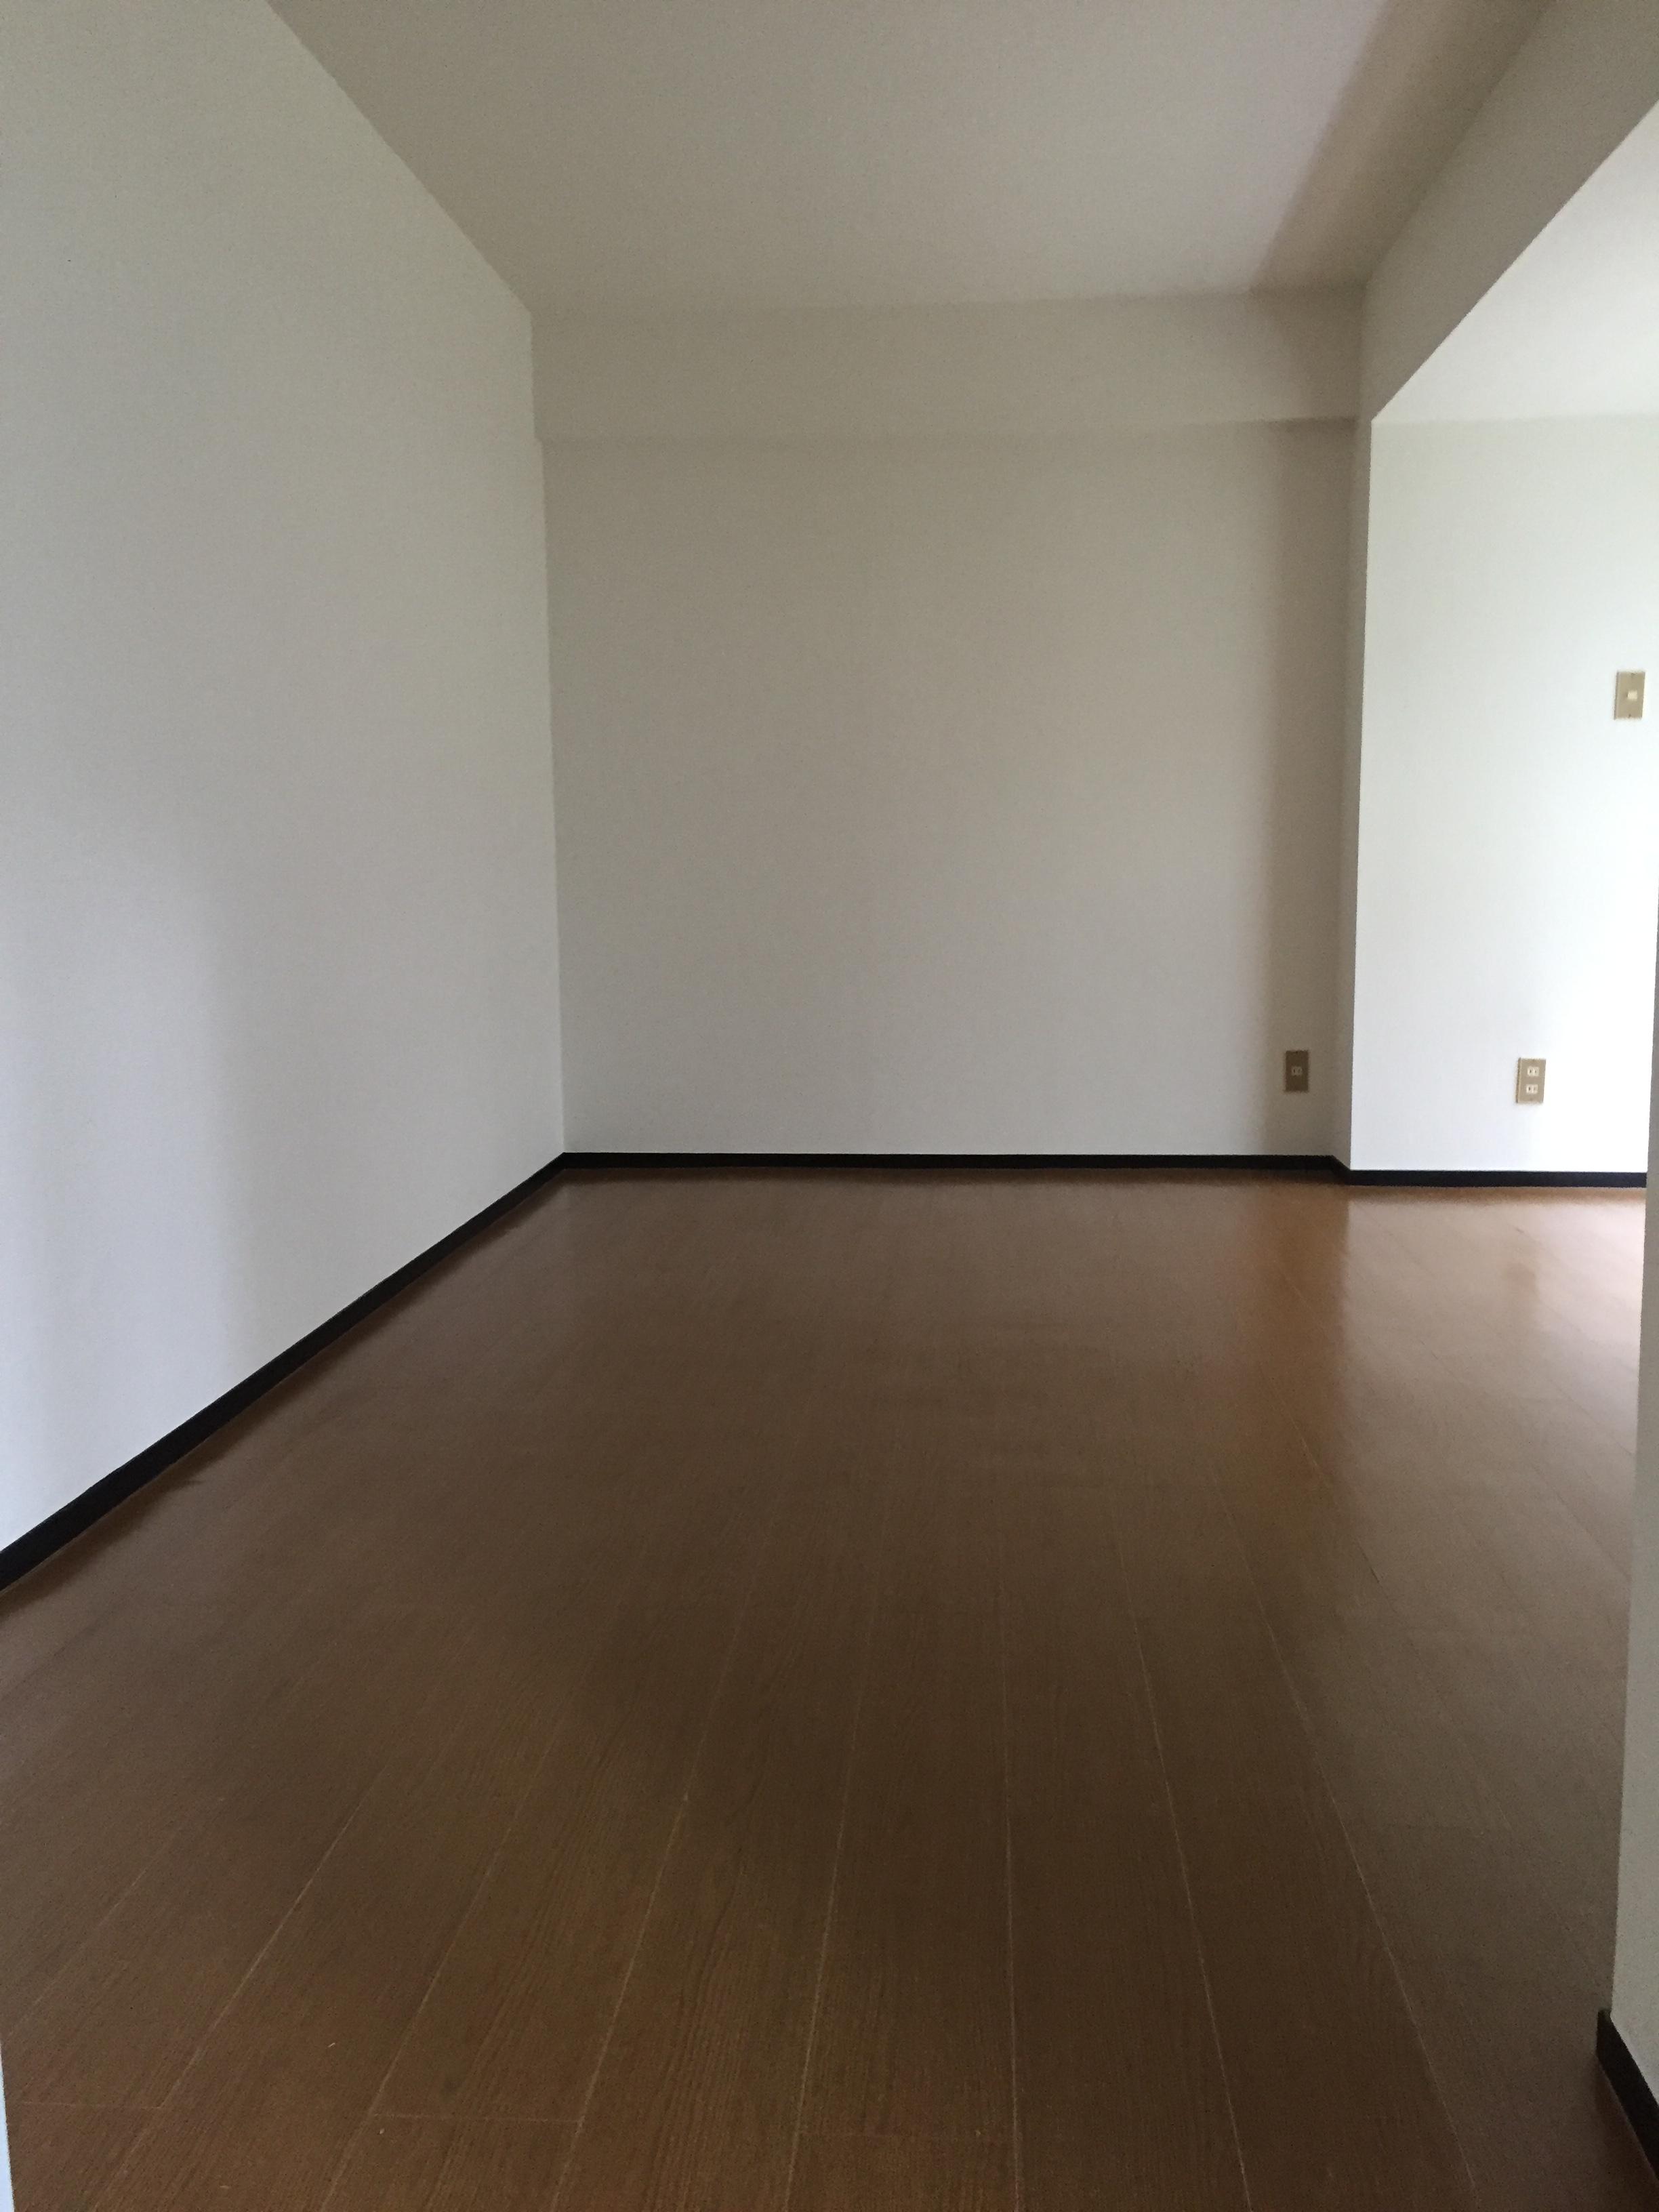 JR山手線「原宿駅」徒歩10分 分譲賃貸マンション 1DK 32.18㎡ 事務所相談可 画像12